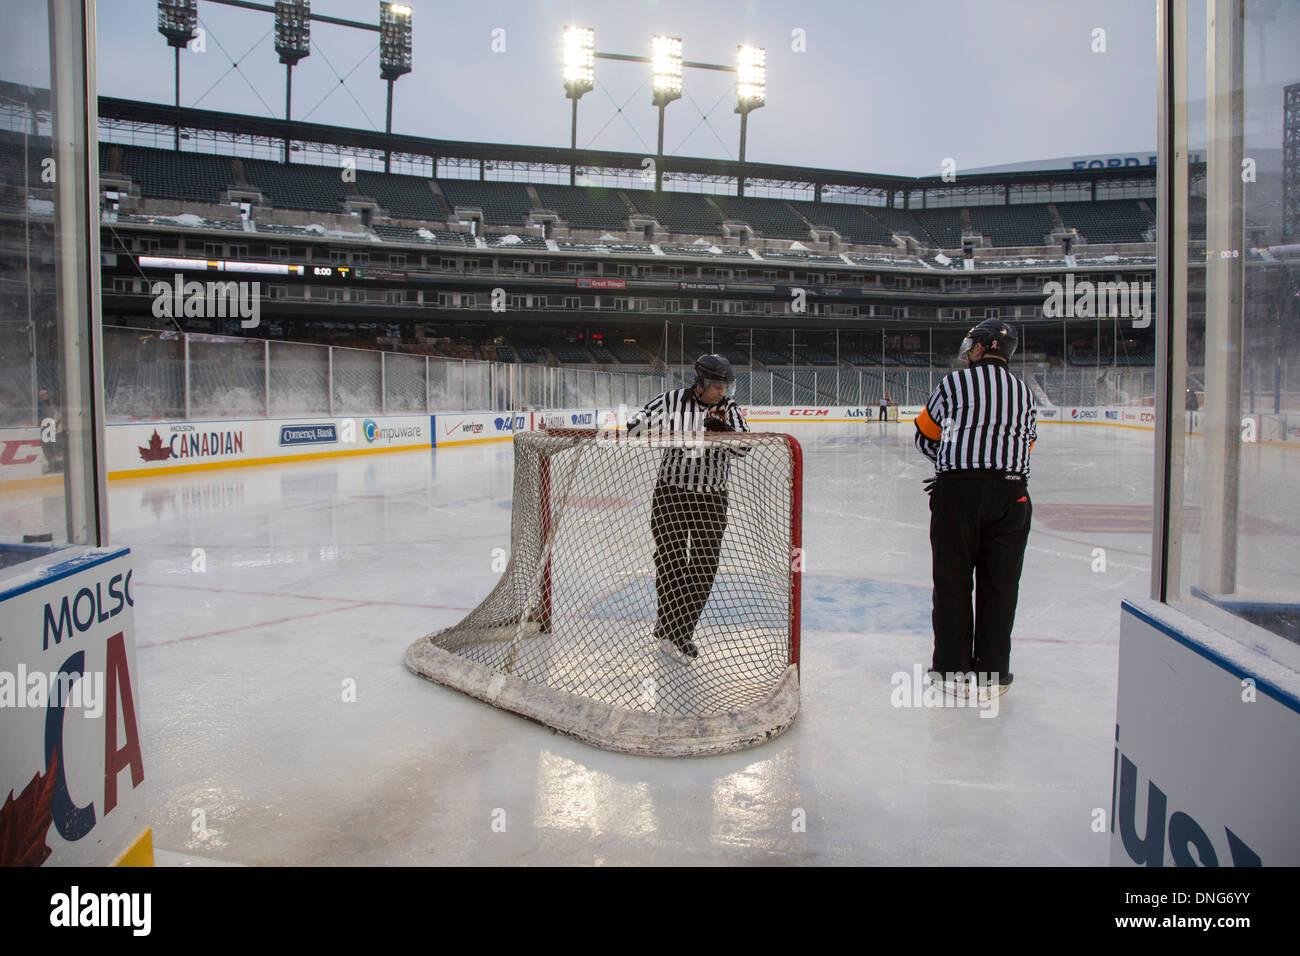 Referees Prepare Nets for High School Girls Ice Hockey - Stock Image